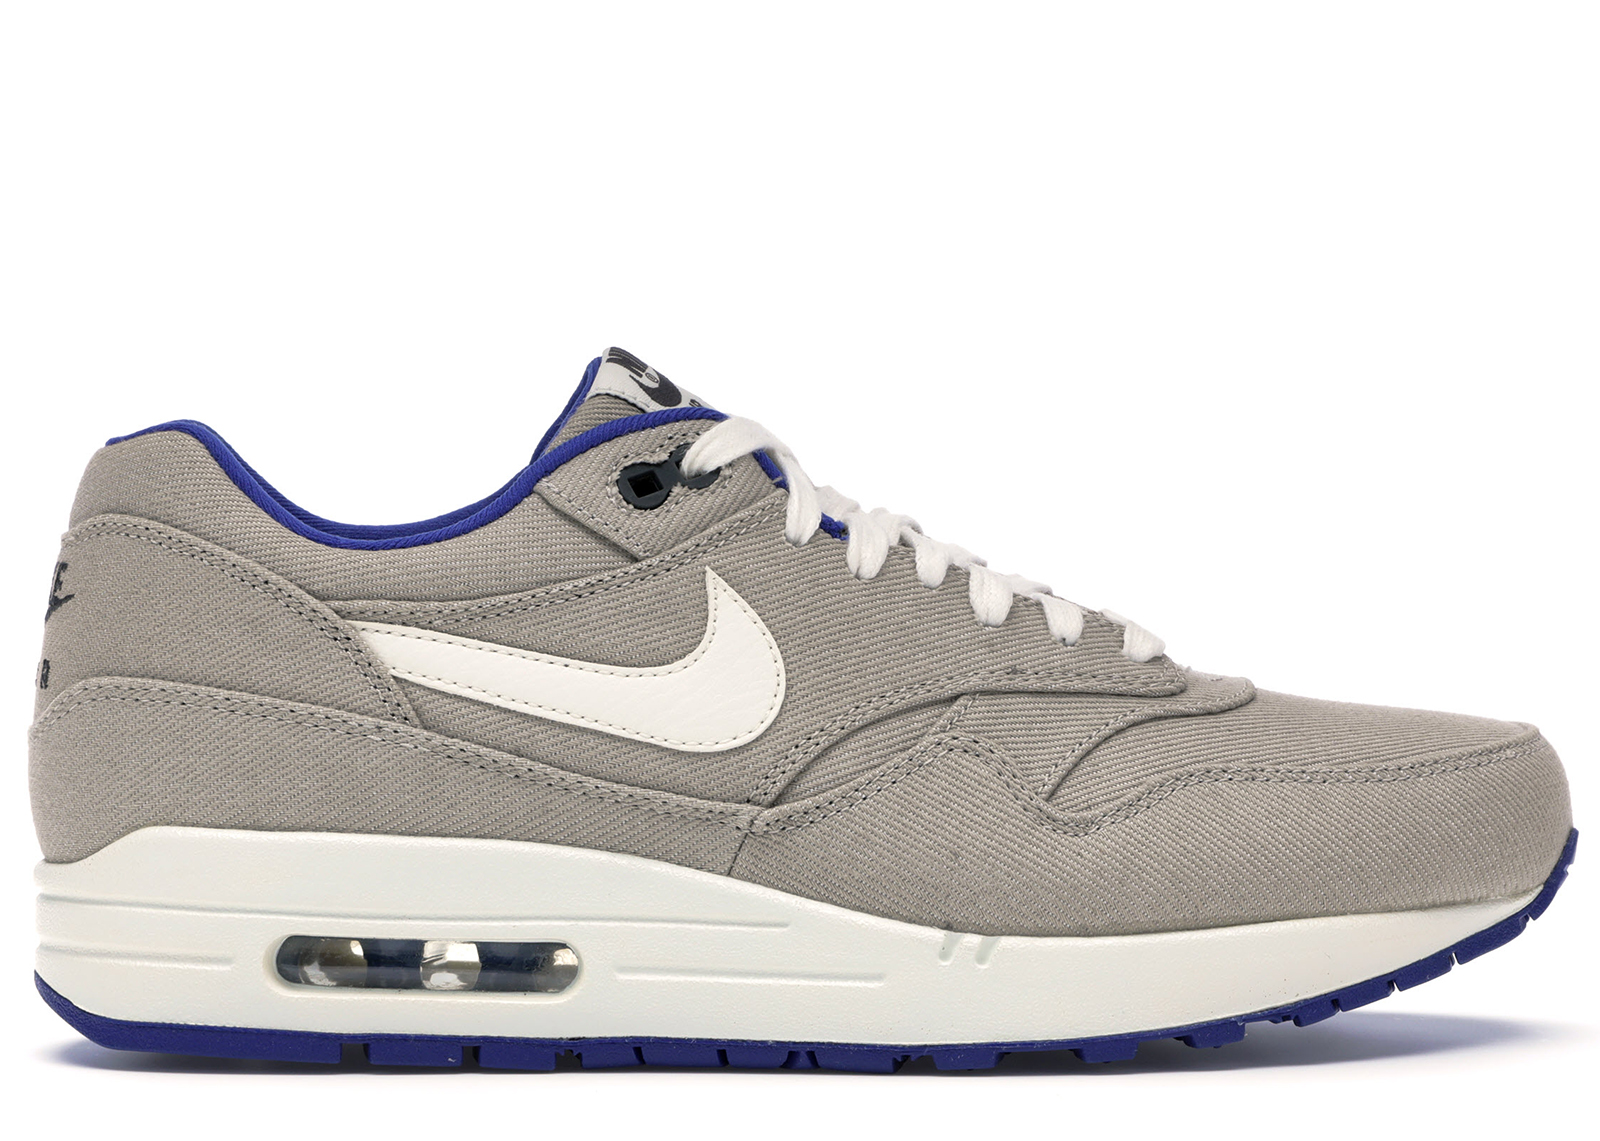 Nike Air Max 1 Classic Stone - 512033-040